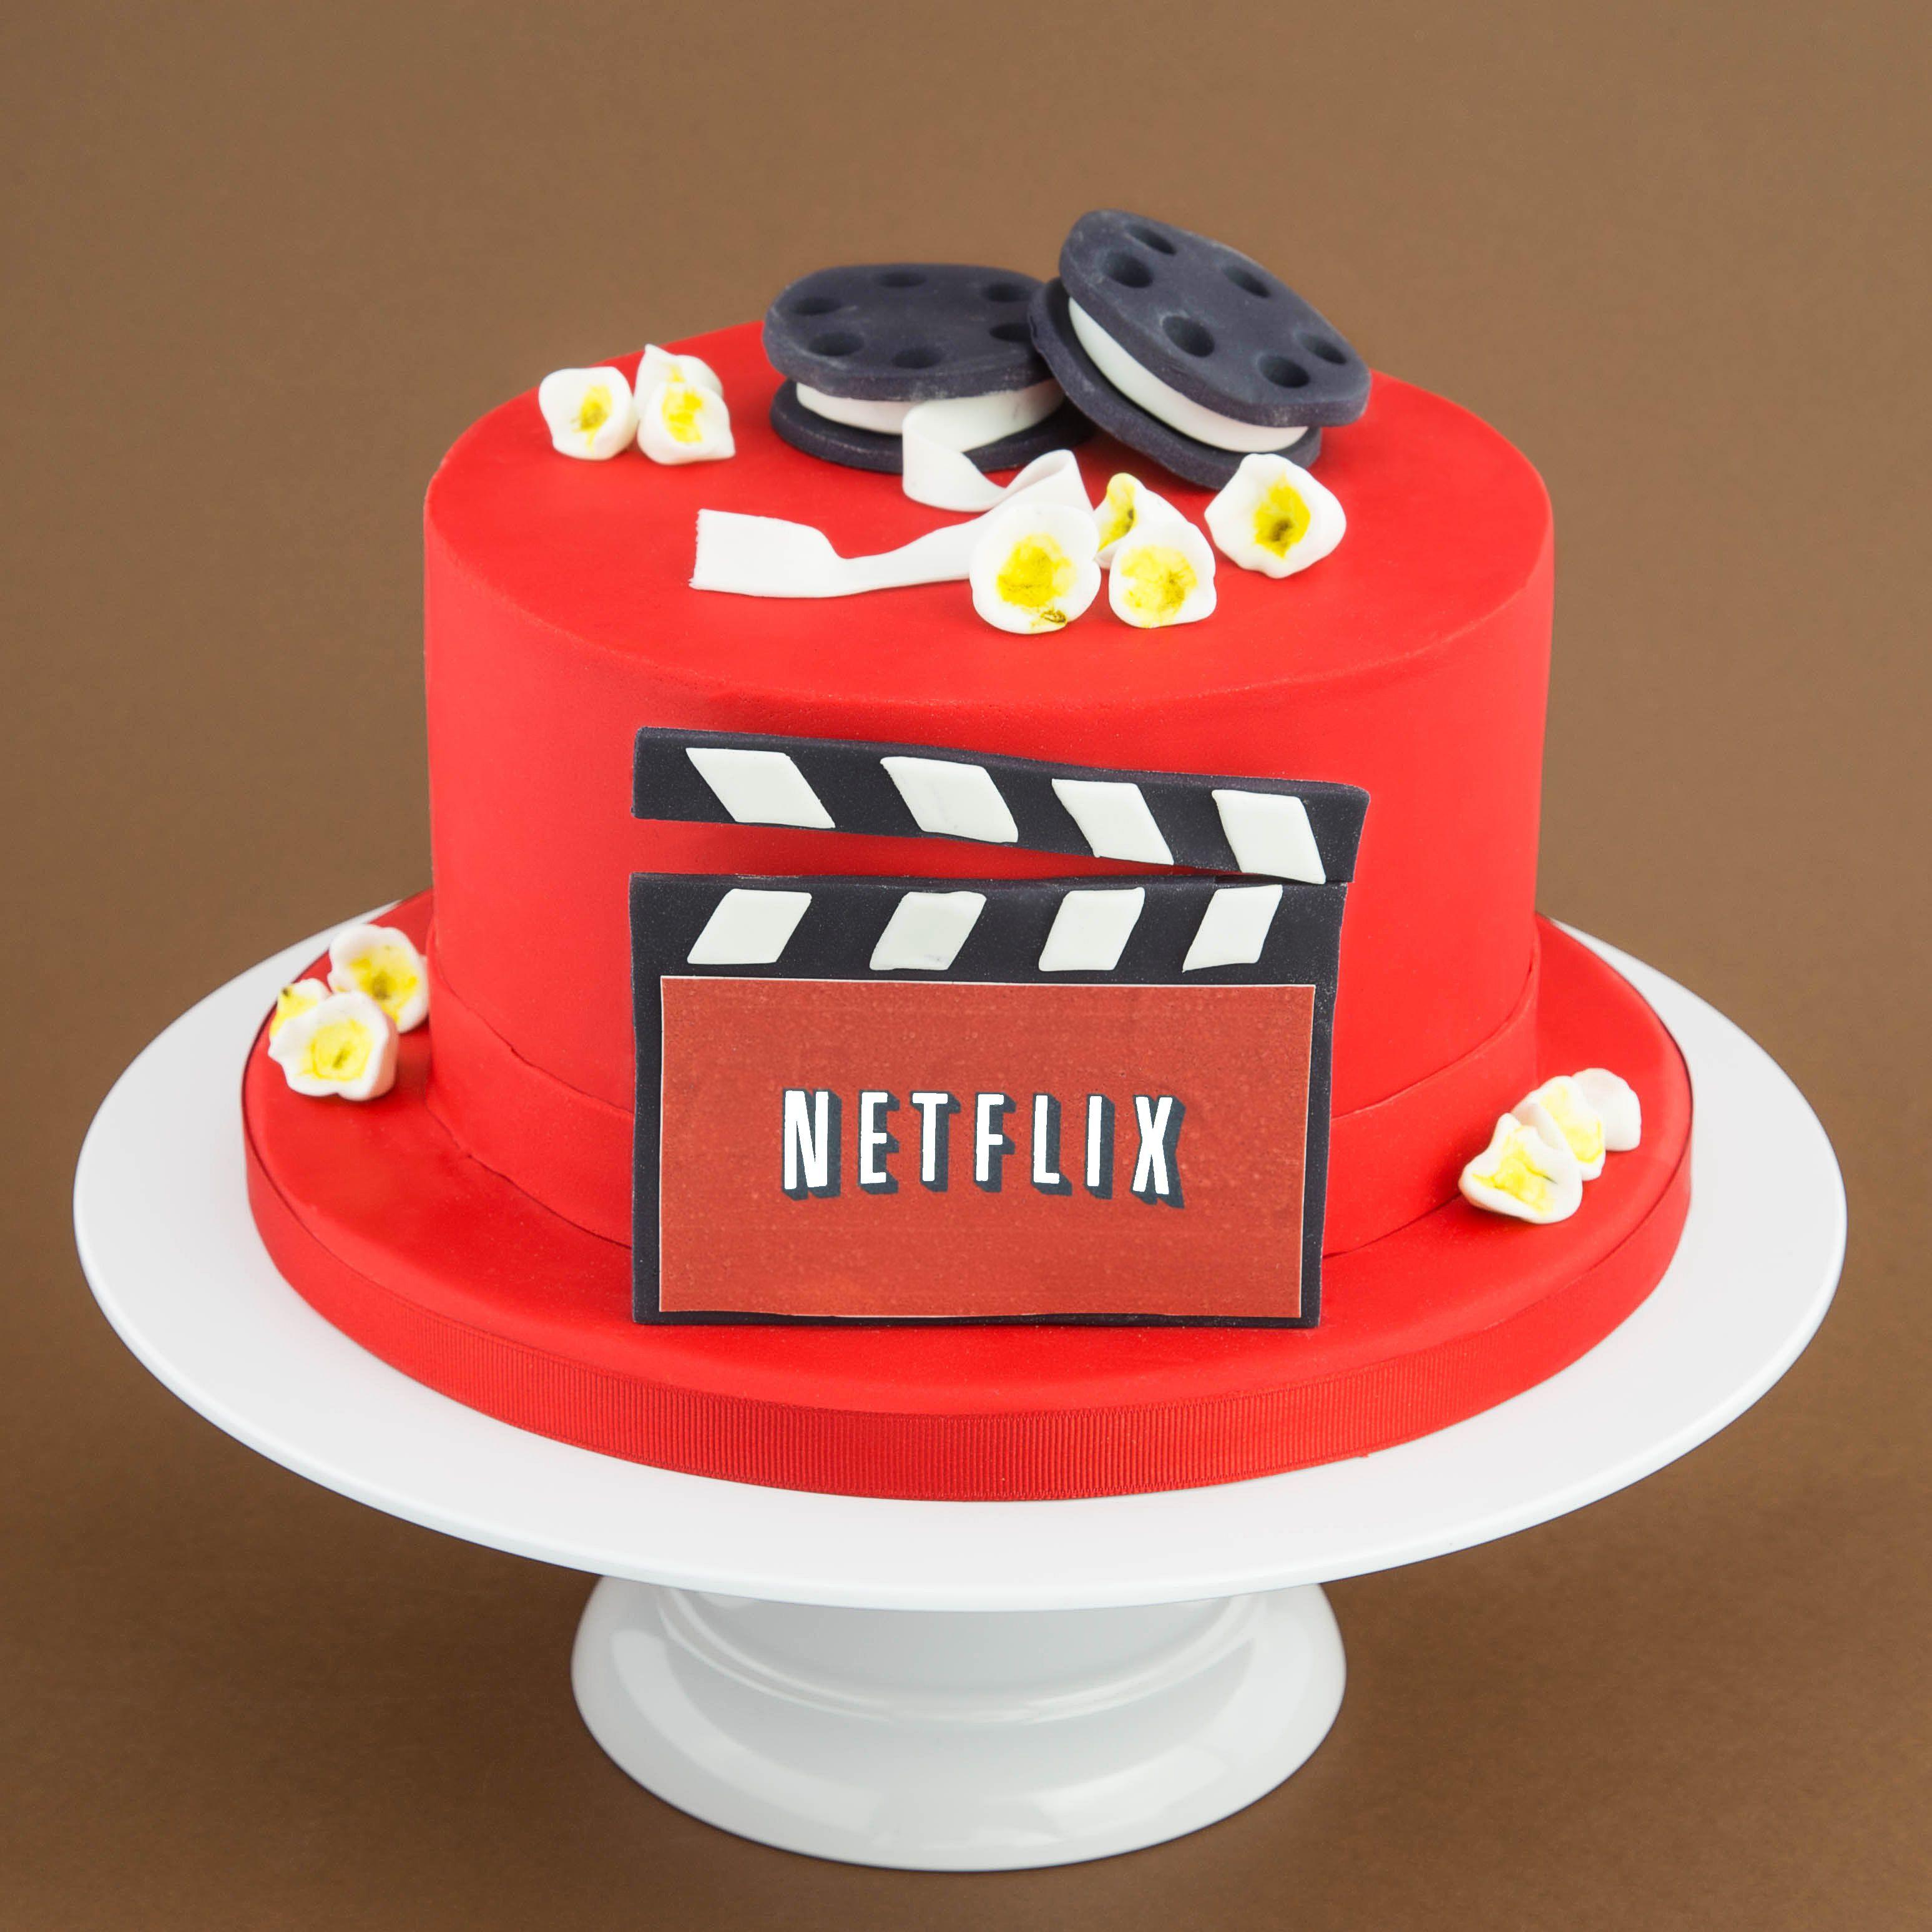 Netflix Chill Cake Bolos De Aniversario Bolo Festa Aniversario